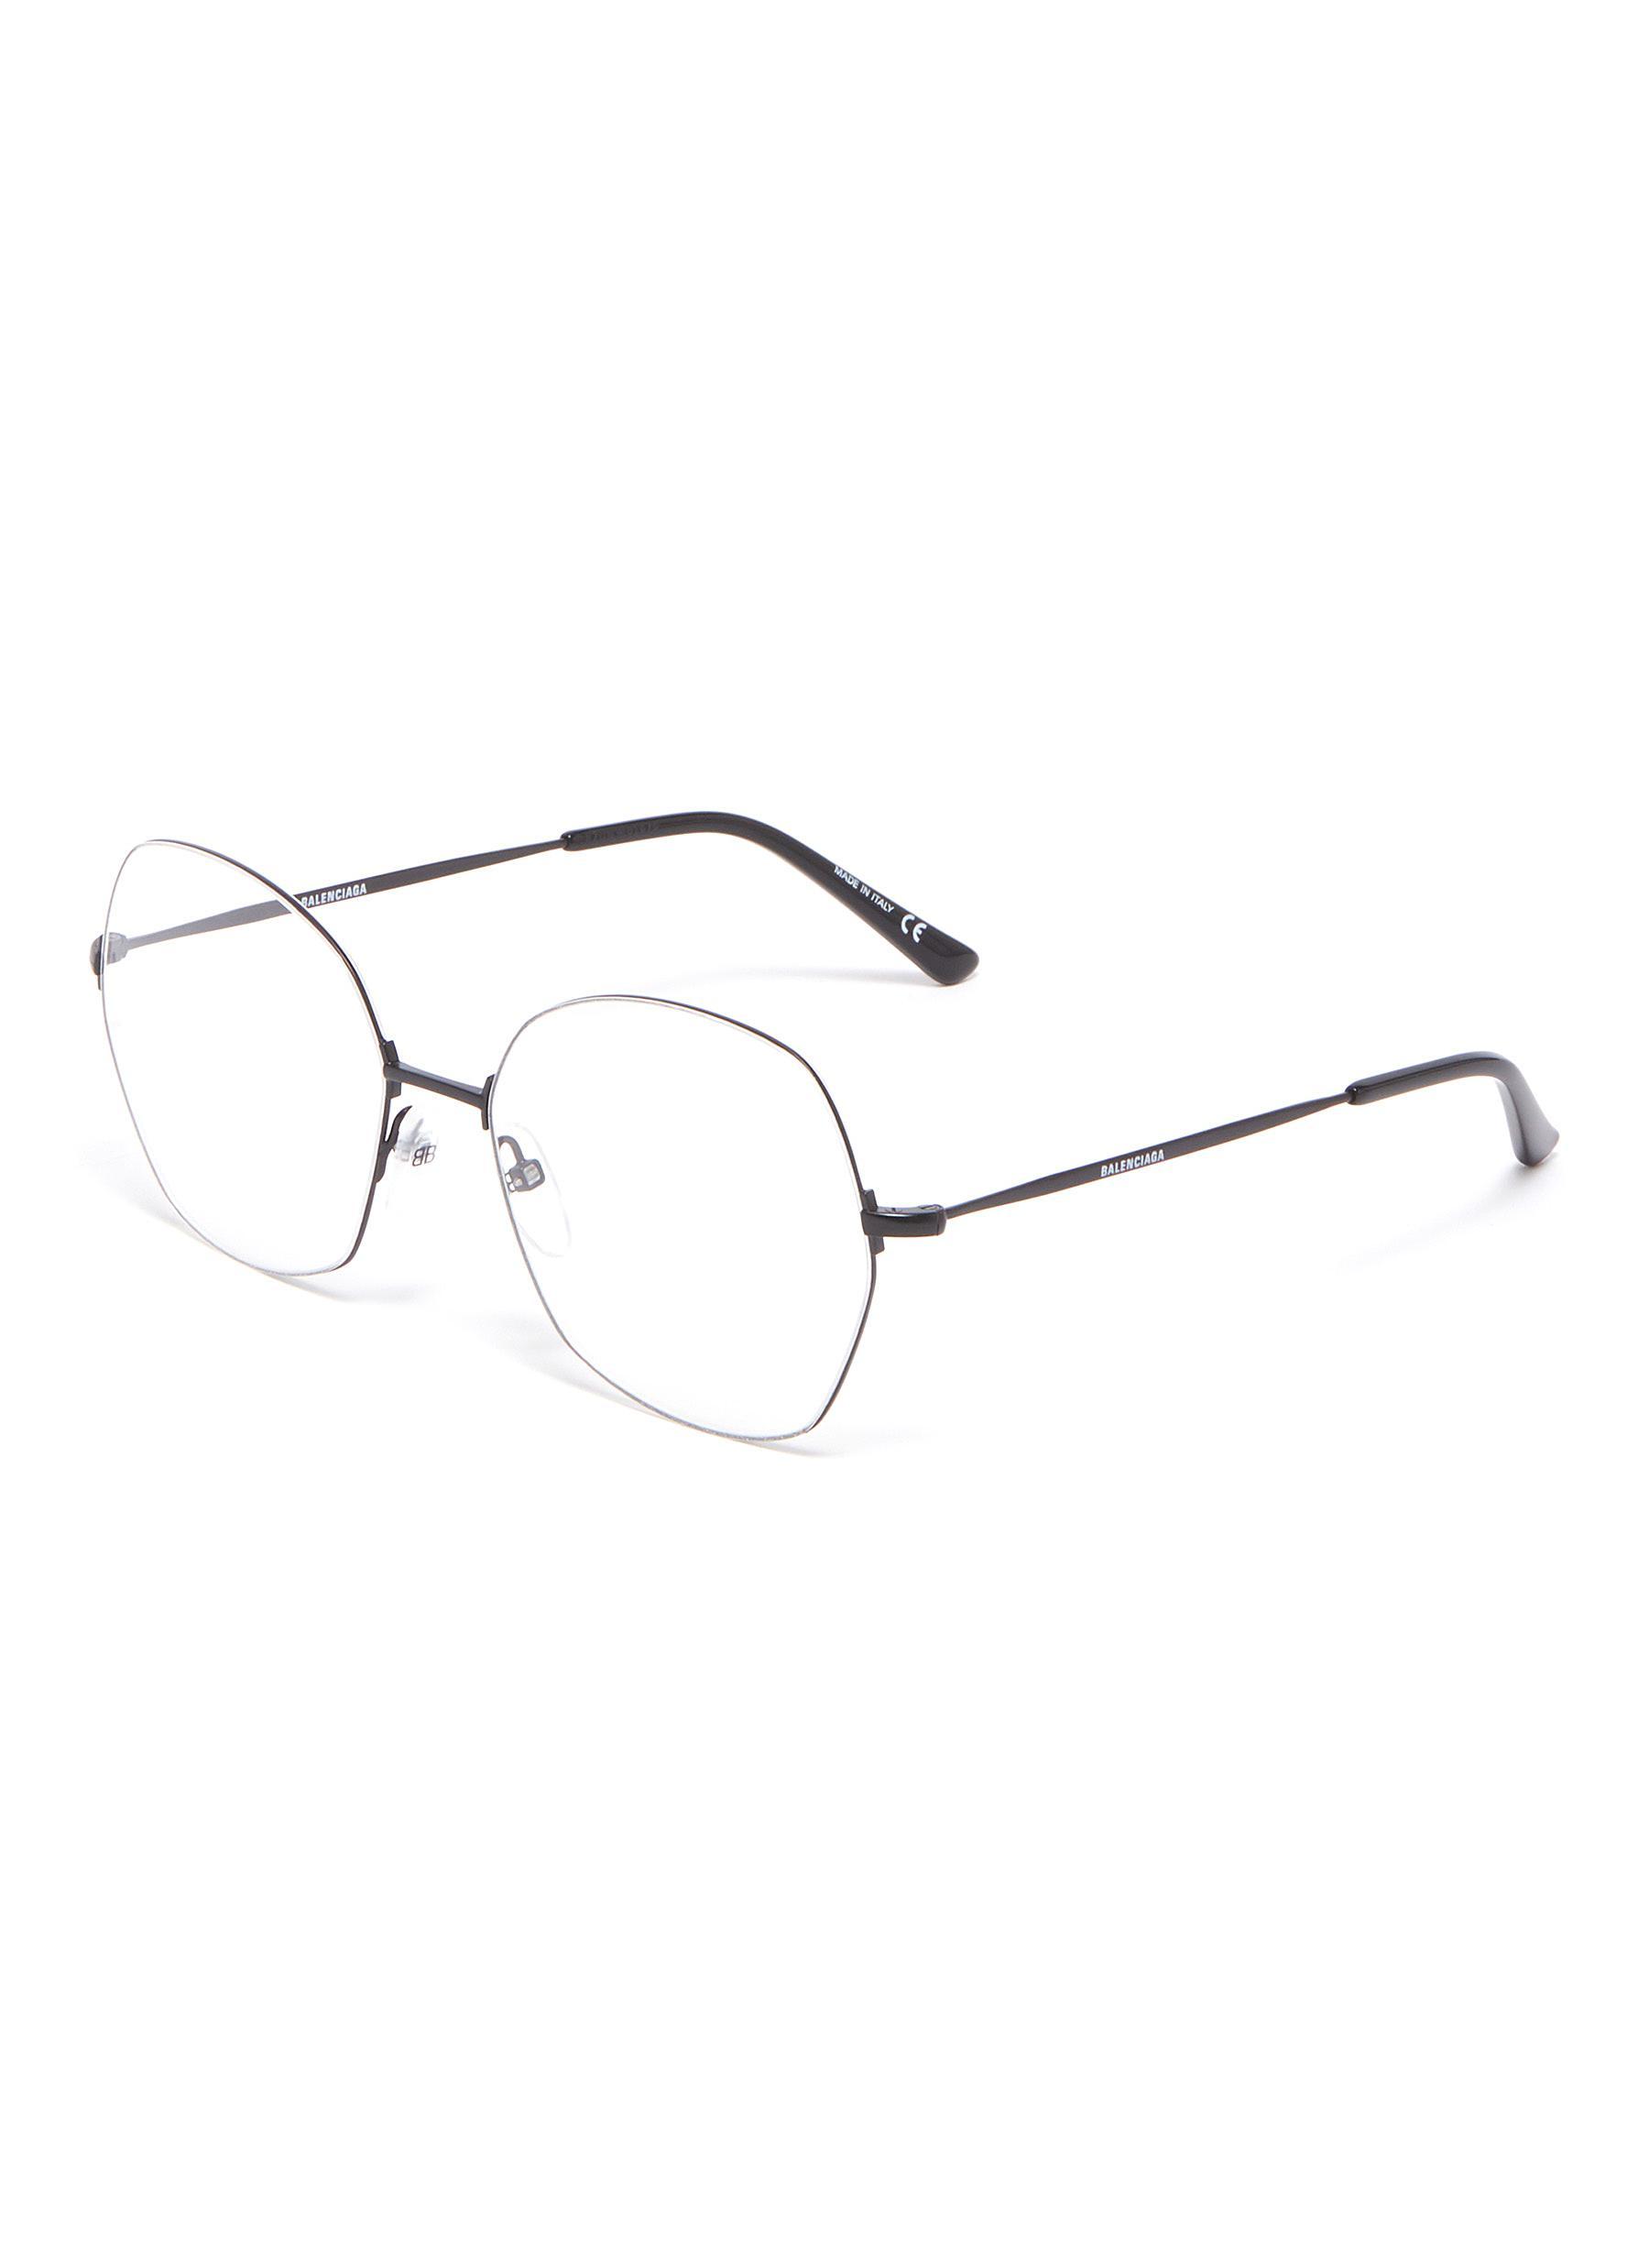 0c6eeae6de Main View - Click To Enlarge - Balenciaga - Metal geometric frame optical  glasses